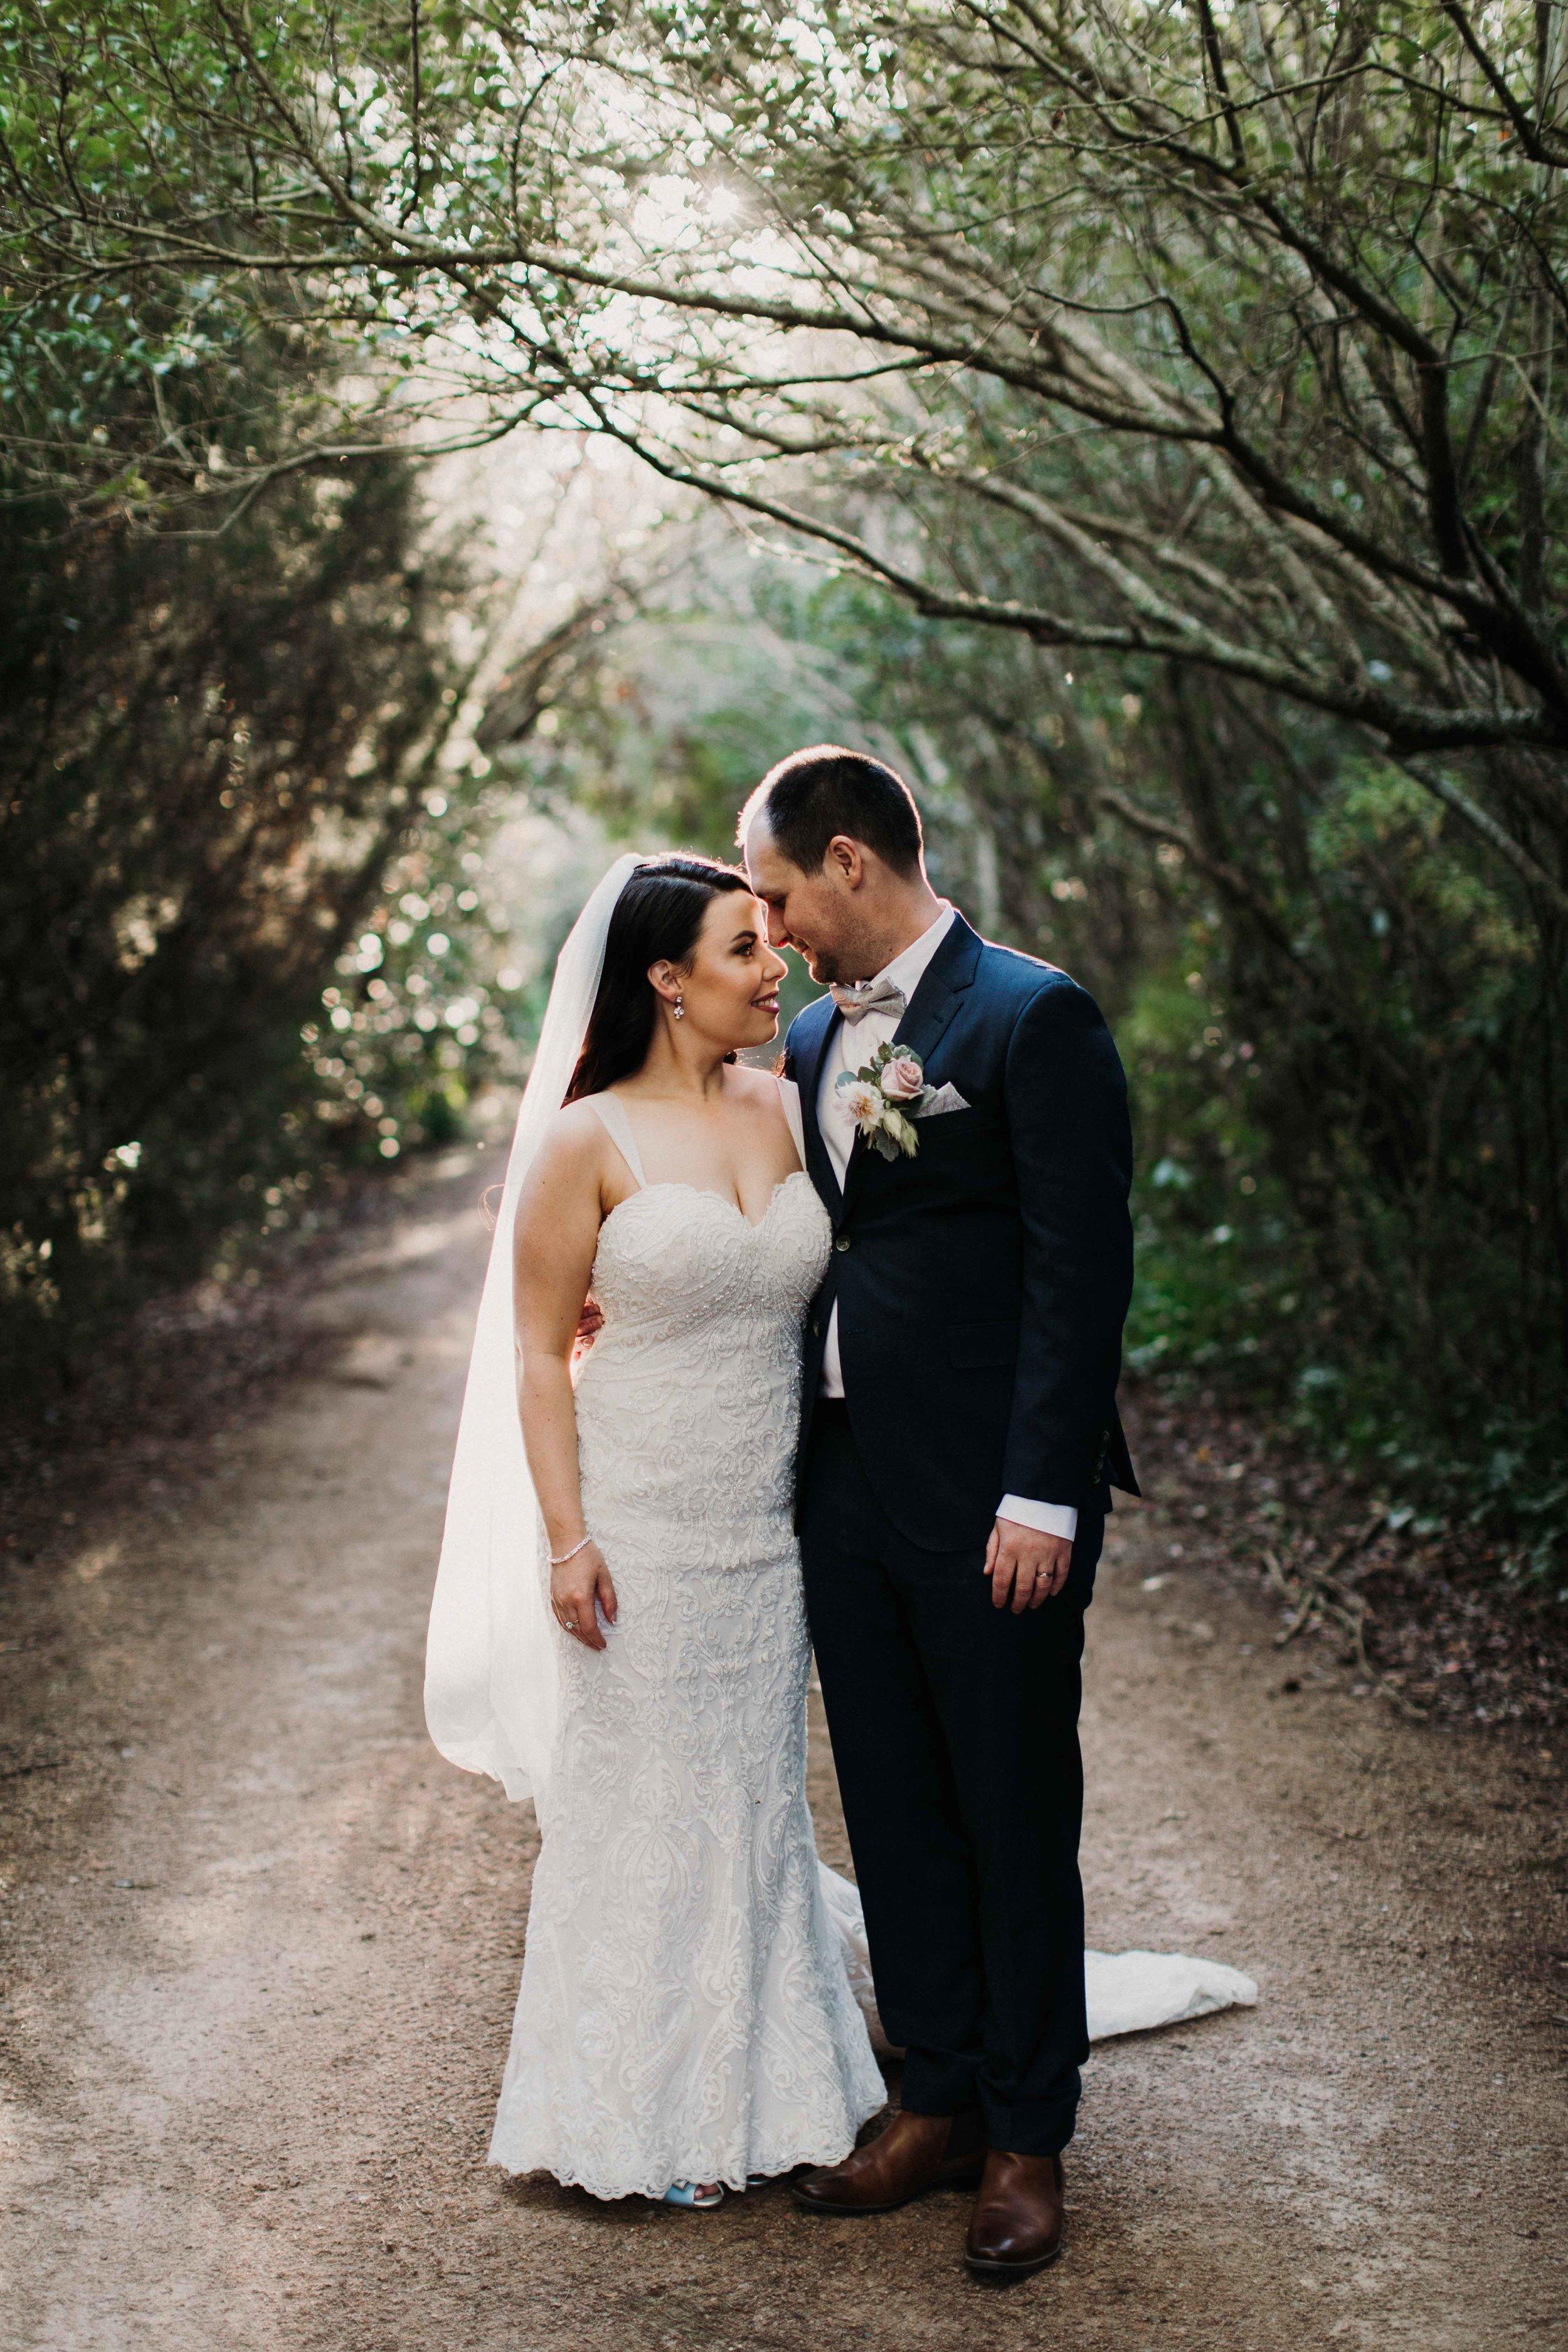 exeter-southern-highlands-wedding-www.emilyobrienphotography.net -109.jpg